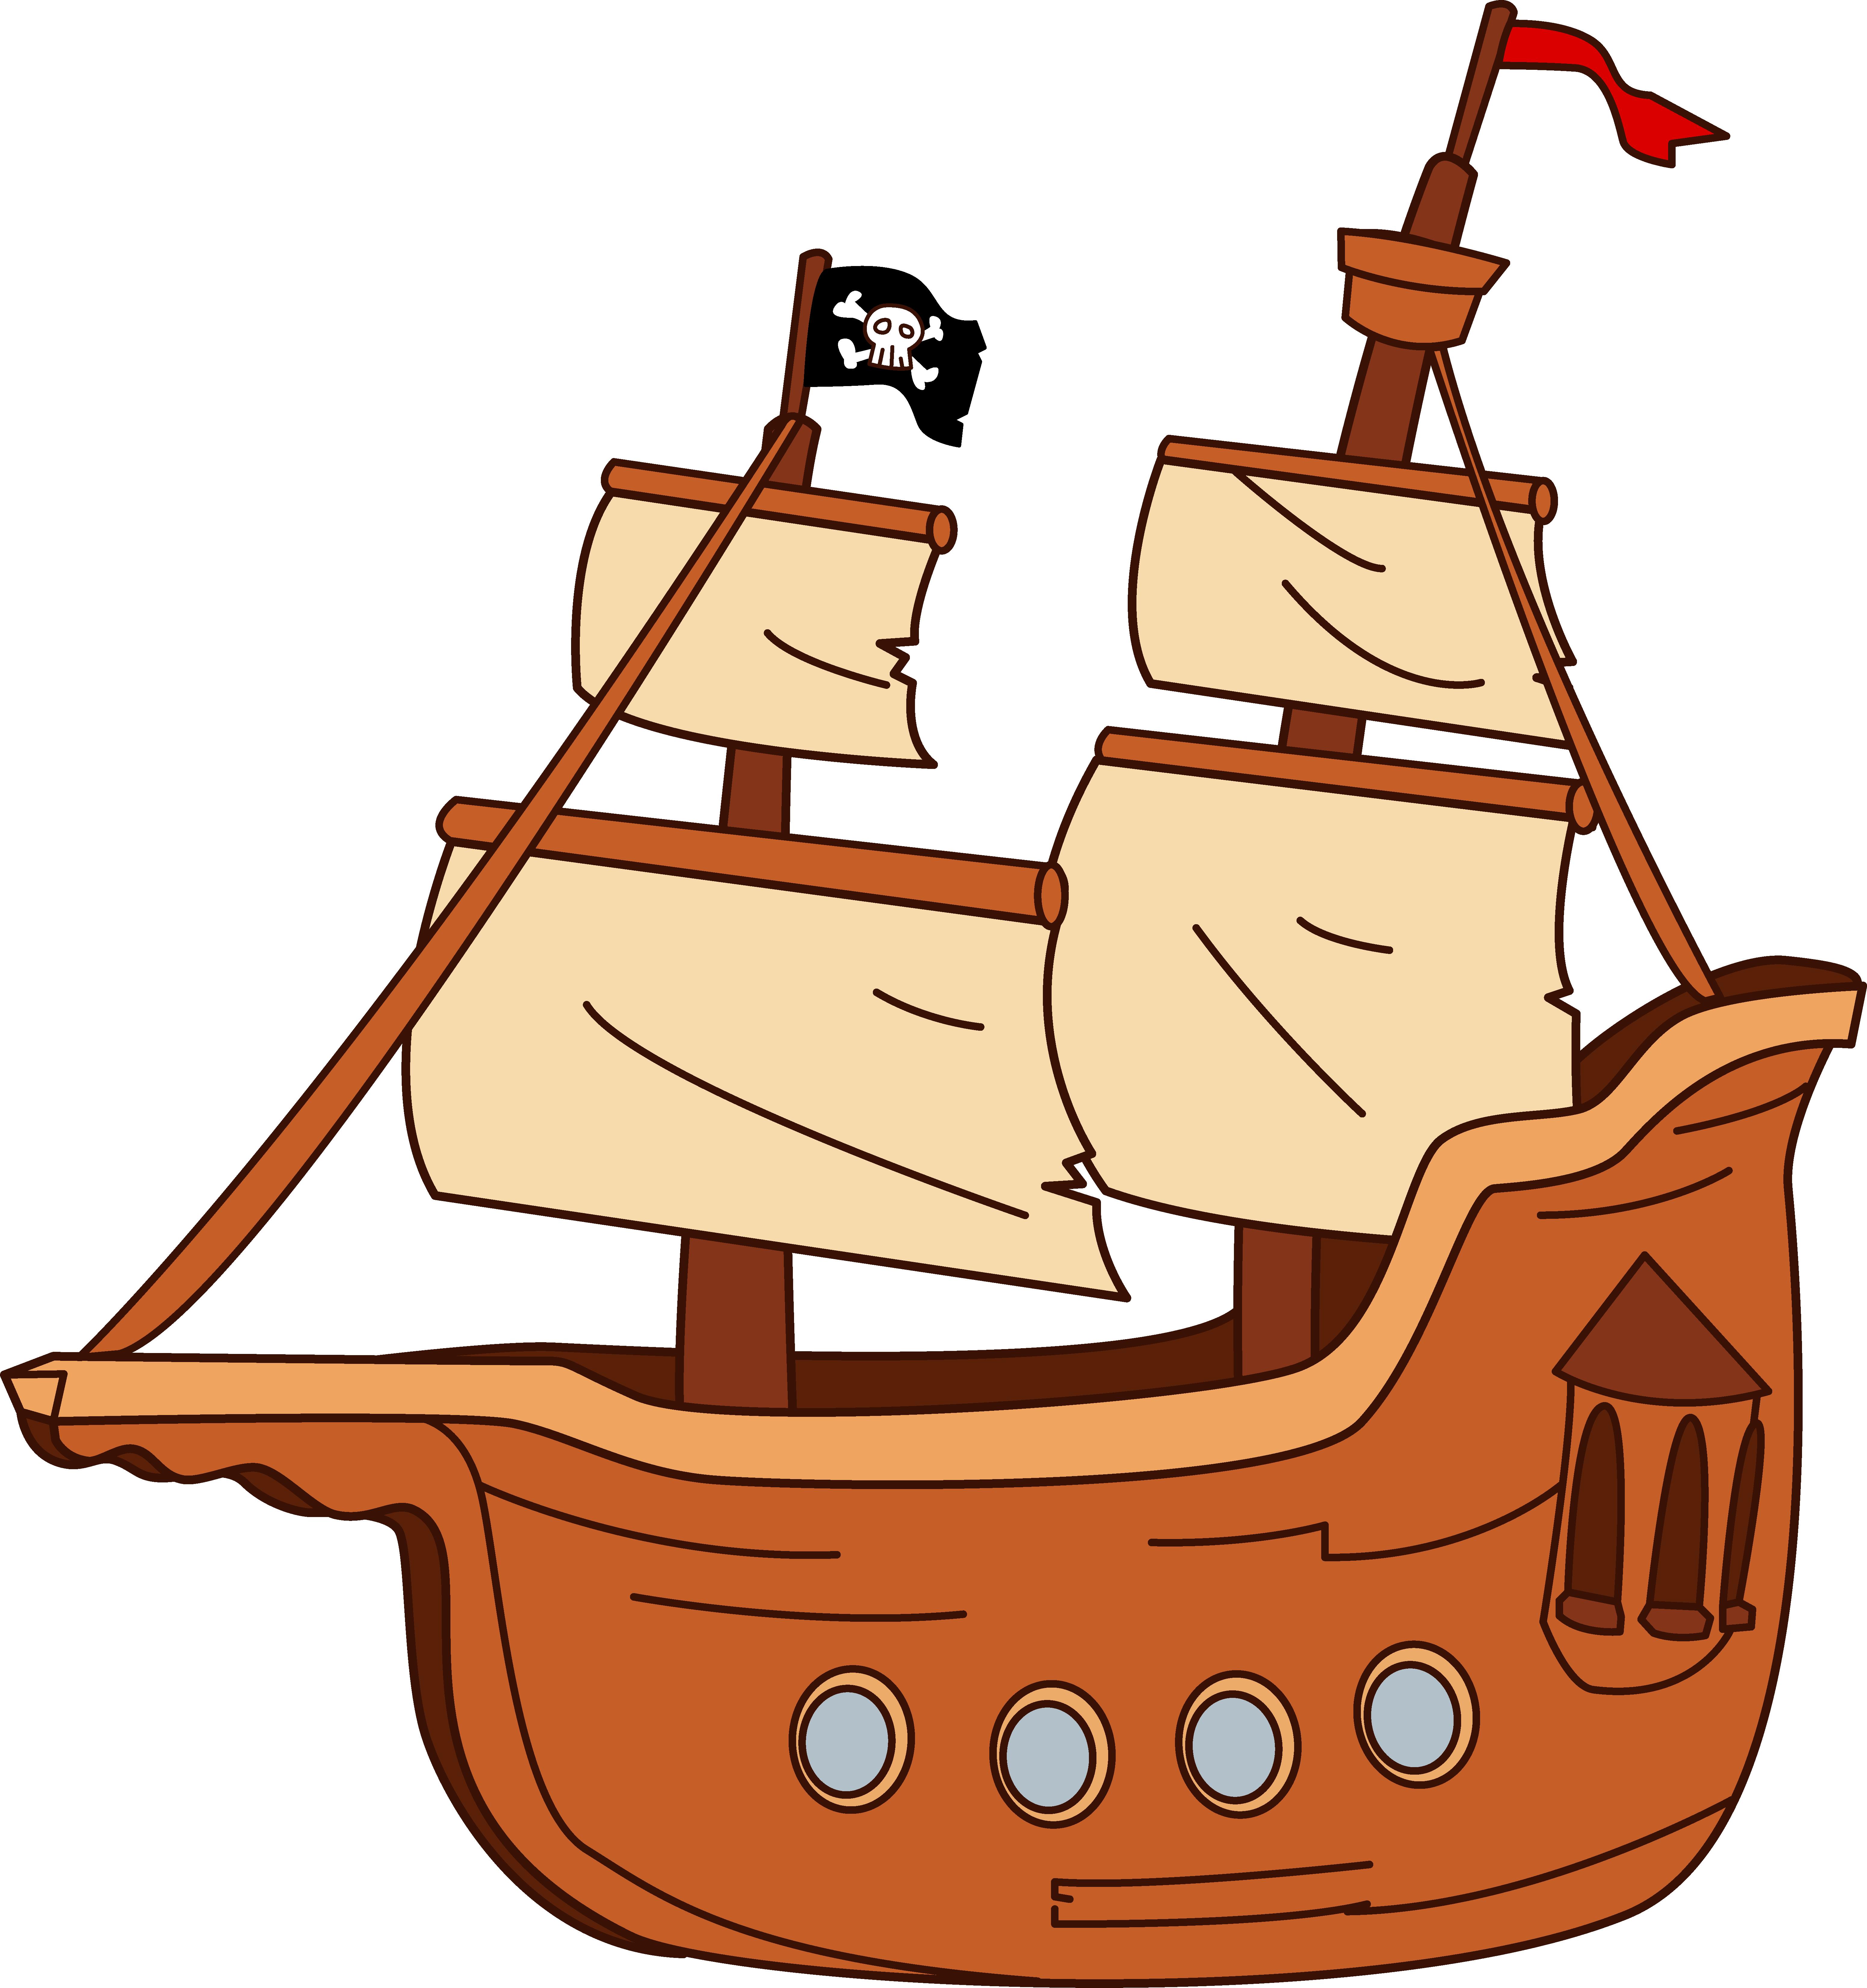 Free Cartoon Boat Png, Download Free Clip Art, Free Clip Art.